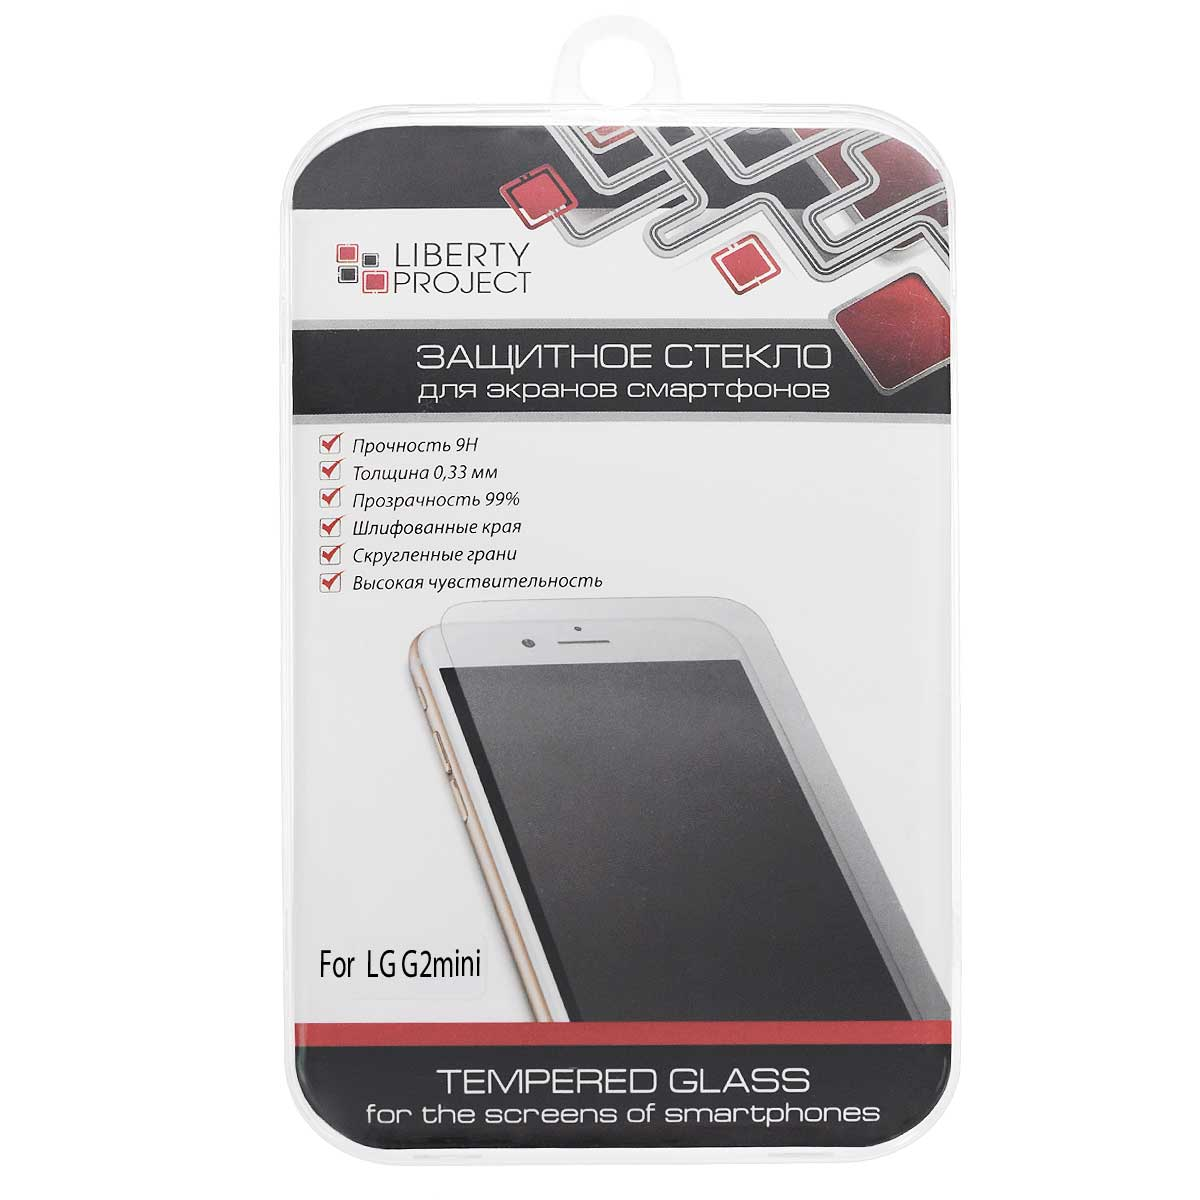 Liberty Project Tempered Glass защитное стекло для LG G2 mini, Clear (0,33 мм) liberty project tempered glass защитное стекло для lg spirit h422 0 33 мм